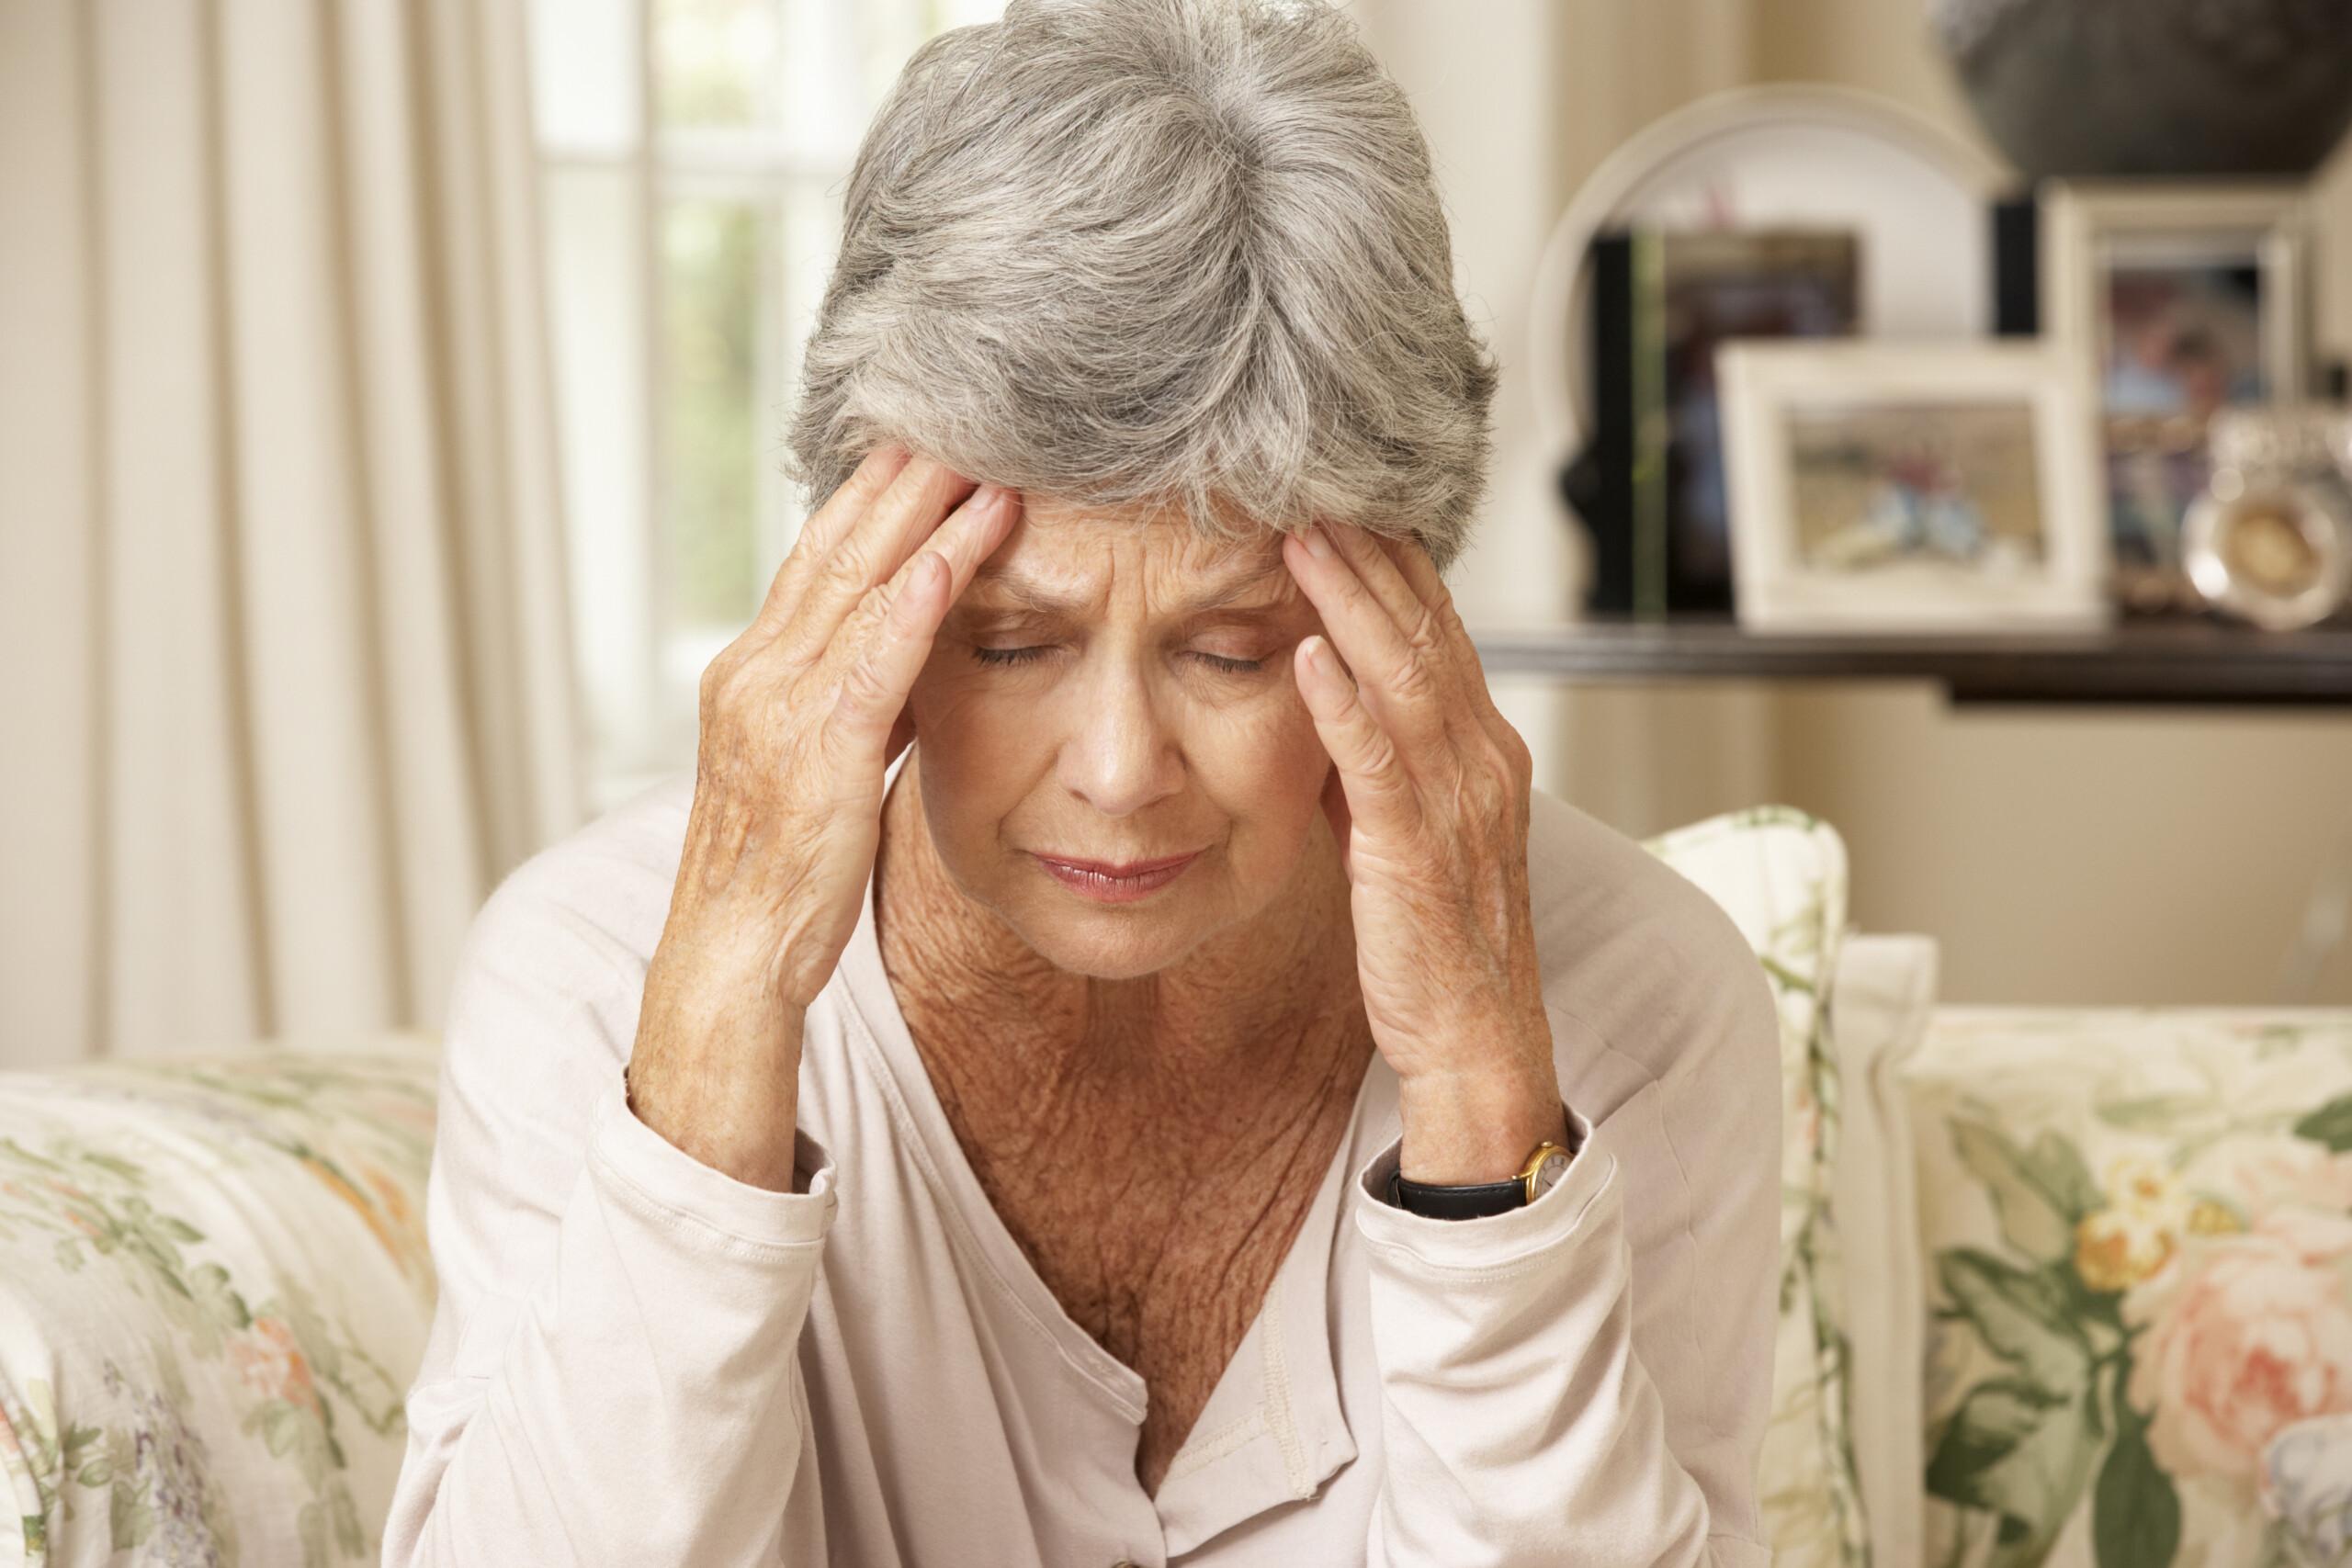 How Common Is Headache in Chronic Subdural Hematoma?